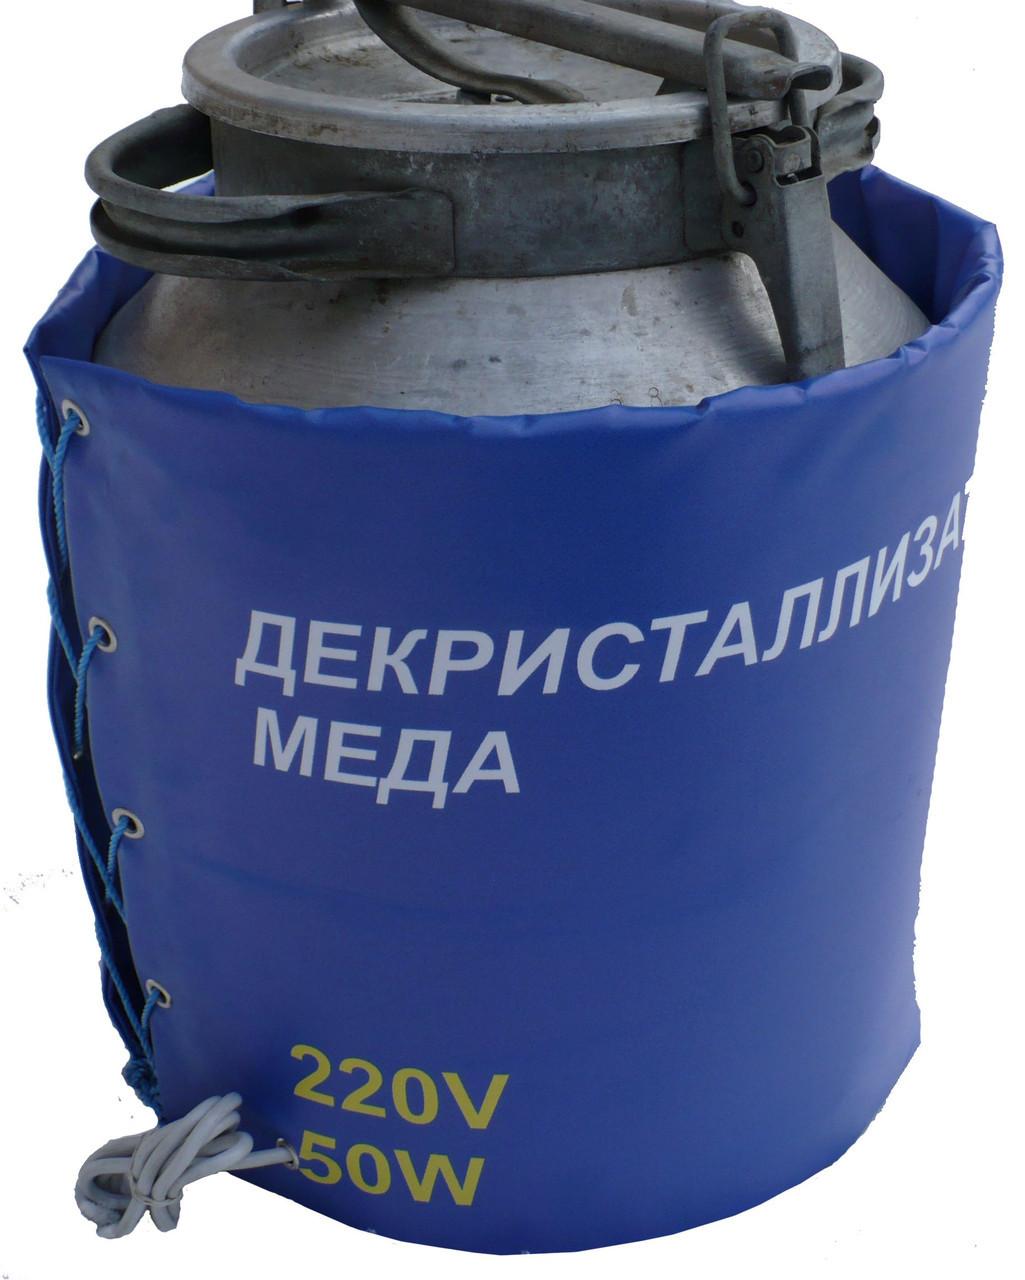 Декристаллизатор меда